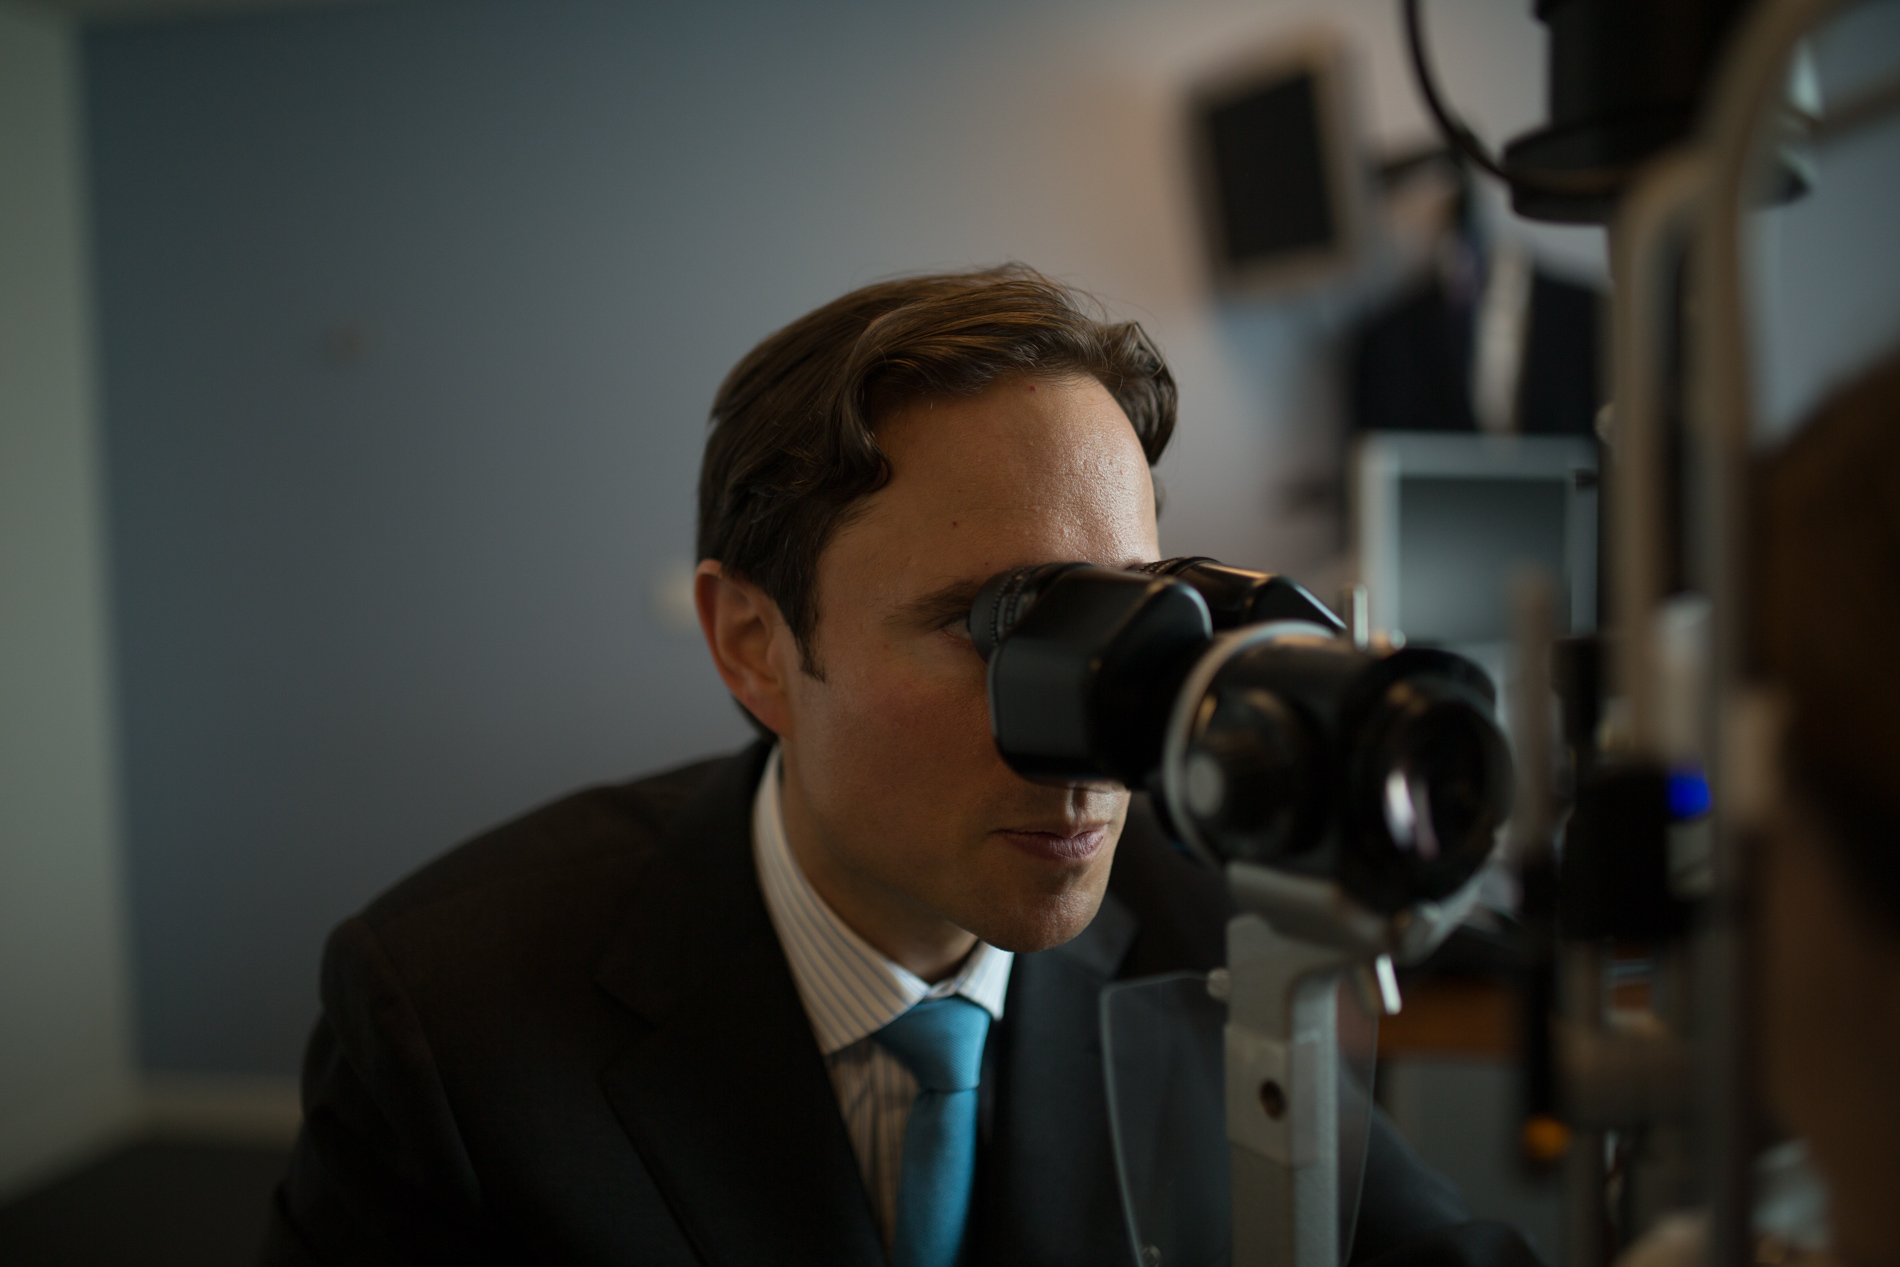 Allon barsam using vision correction equipment: laser eye surgery St Albans